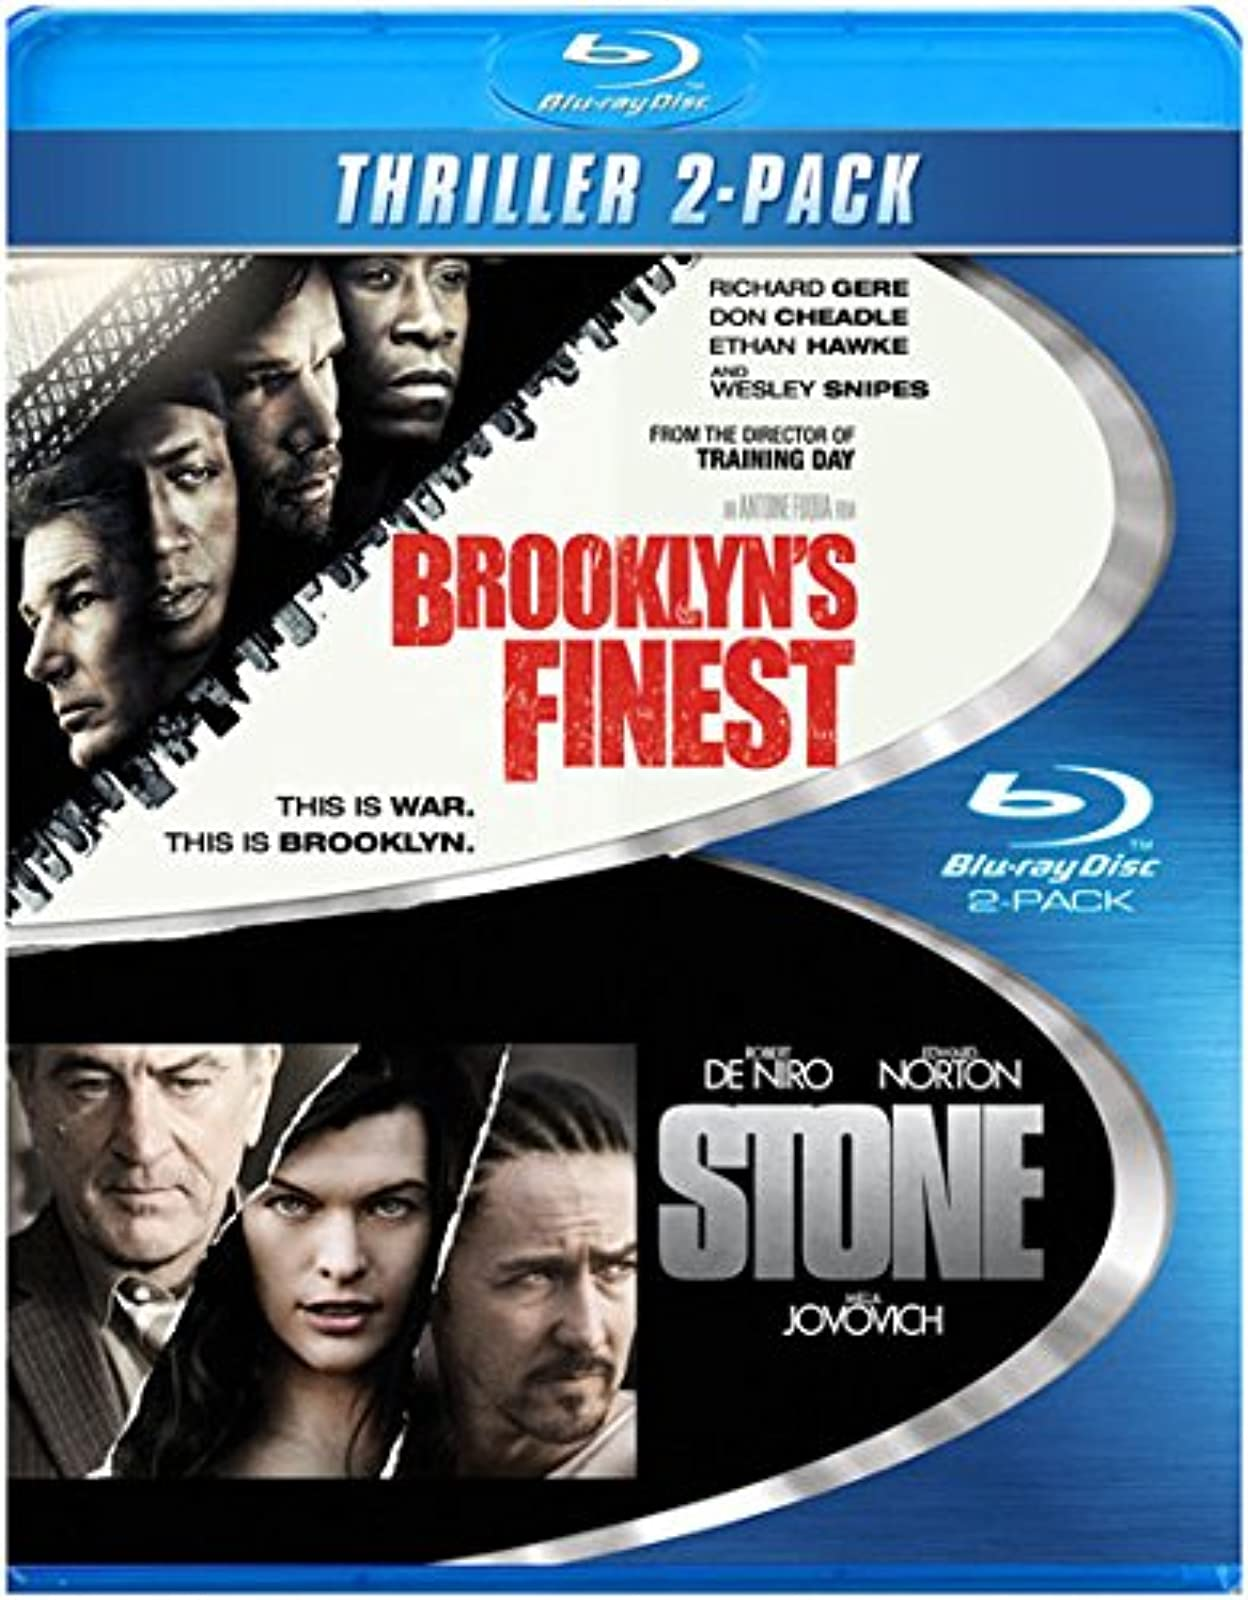 Brooklyn's Finest Blu-Ray On Blu-Ray With Richard Gere